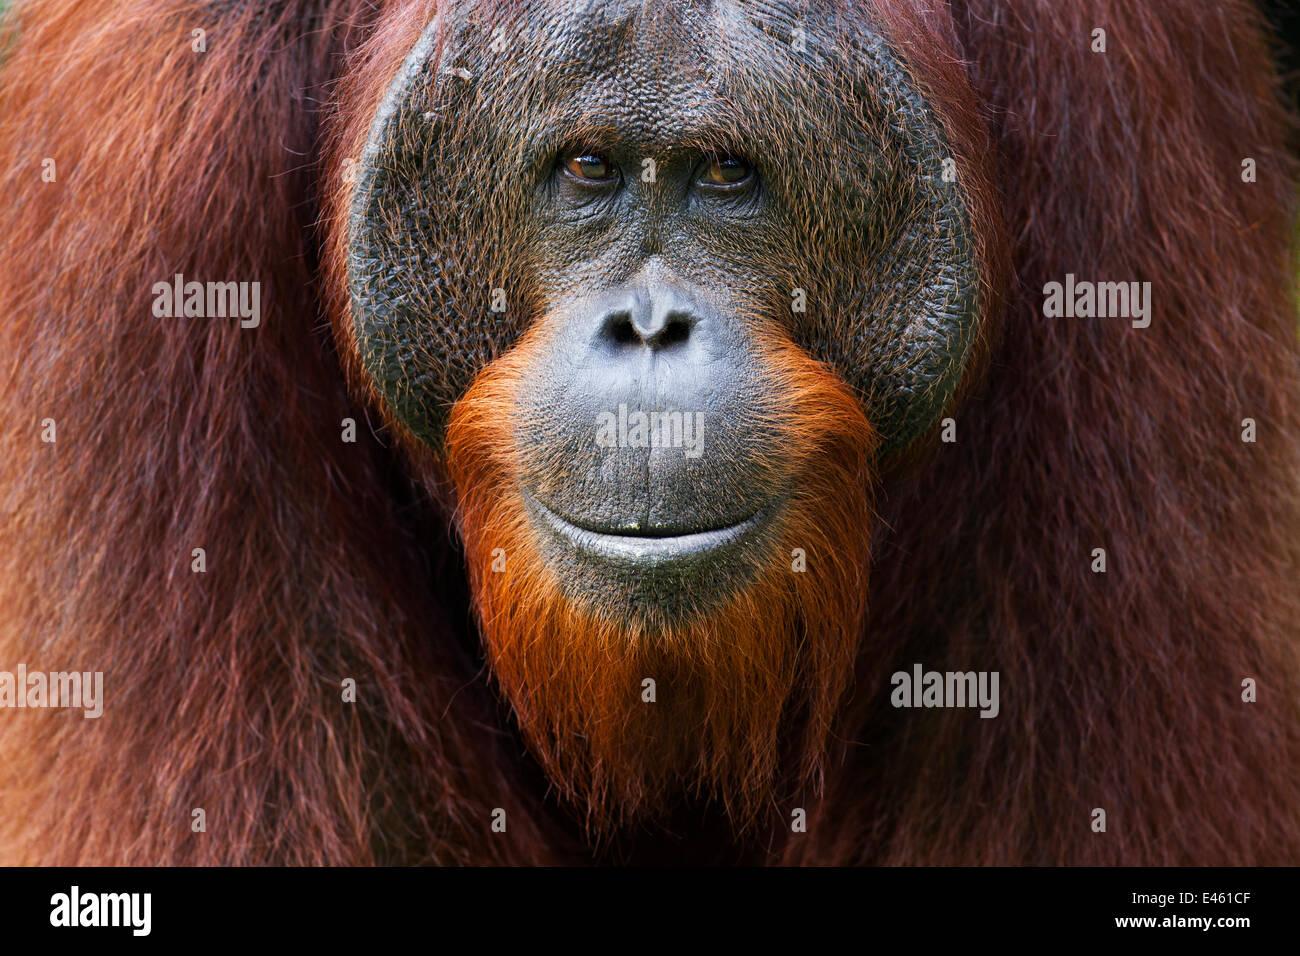 Bornean Orangutan (Pongo pygmaeus wurmbii) young mature male 'Gary' aged 16 years portrait. Camp Leakey, - Stock Image